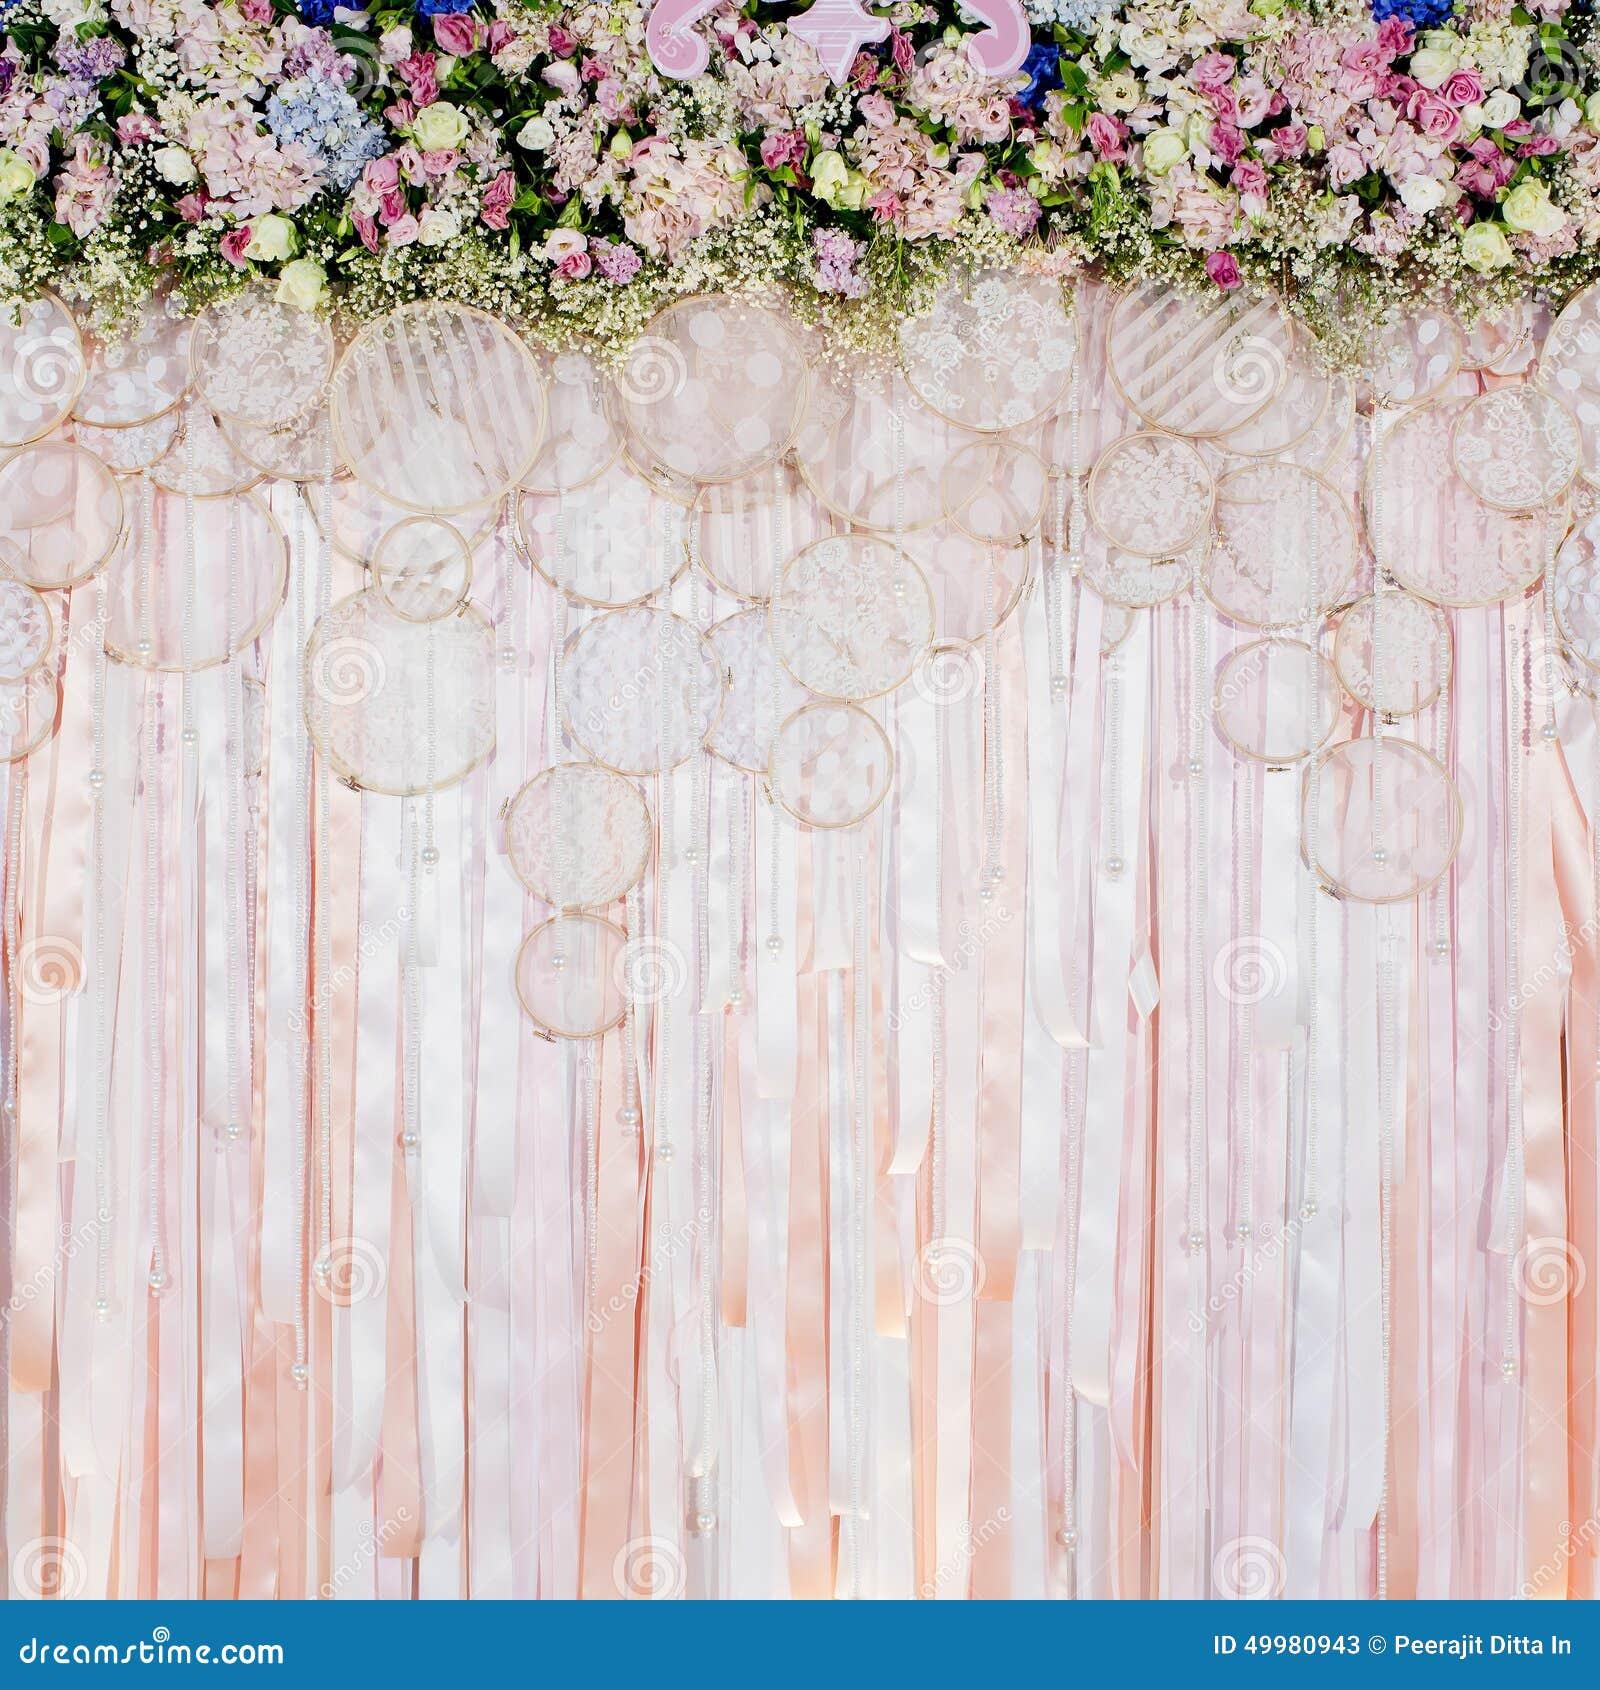 Wedding Flower Background: Beautiful Flowers Background For Wedding Scene Stock Image